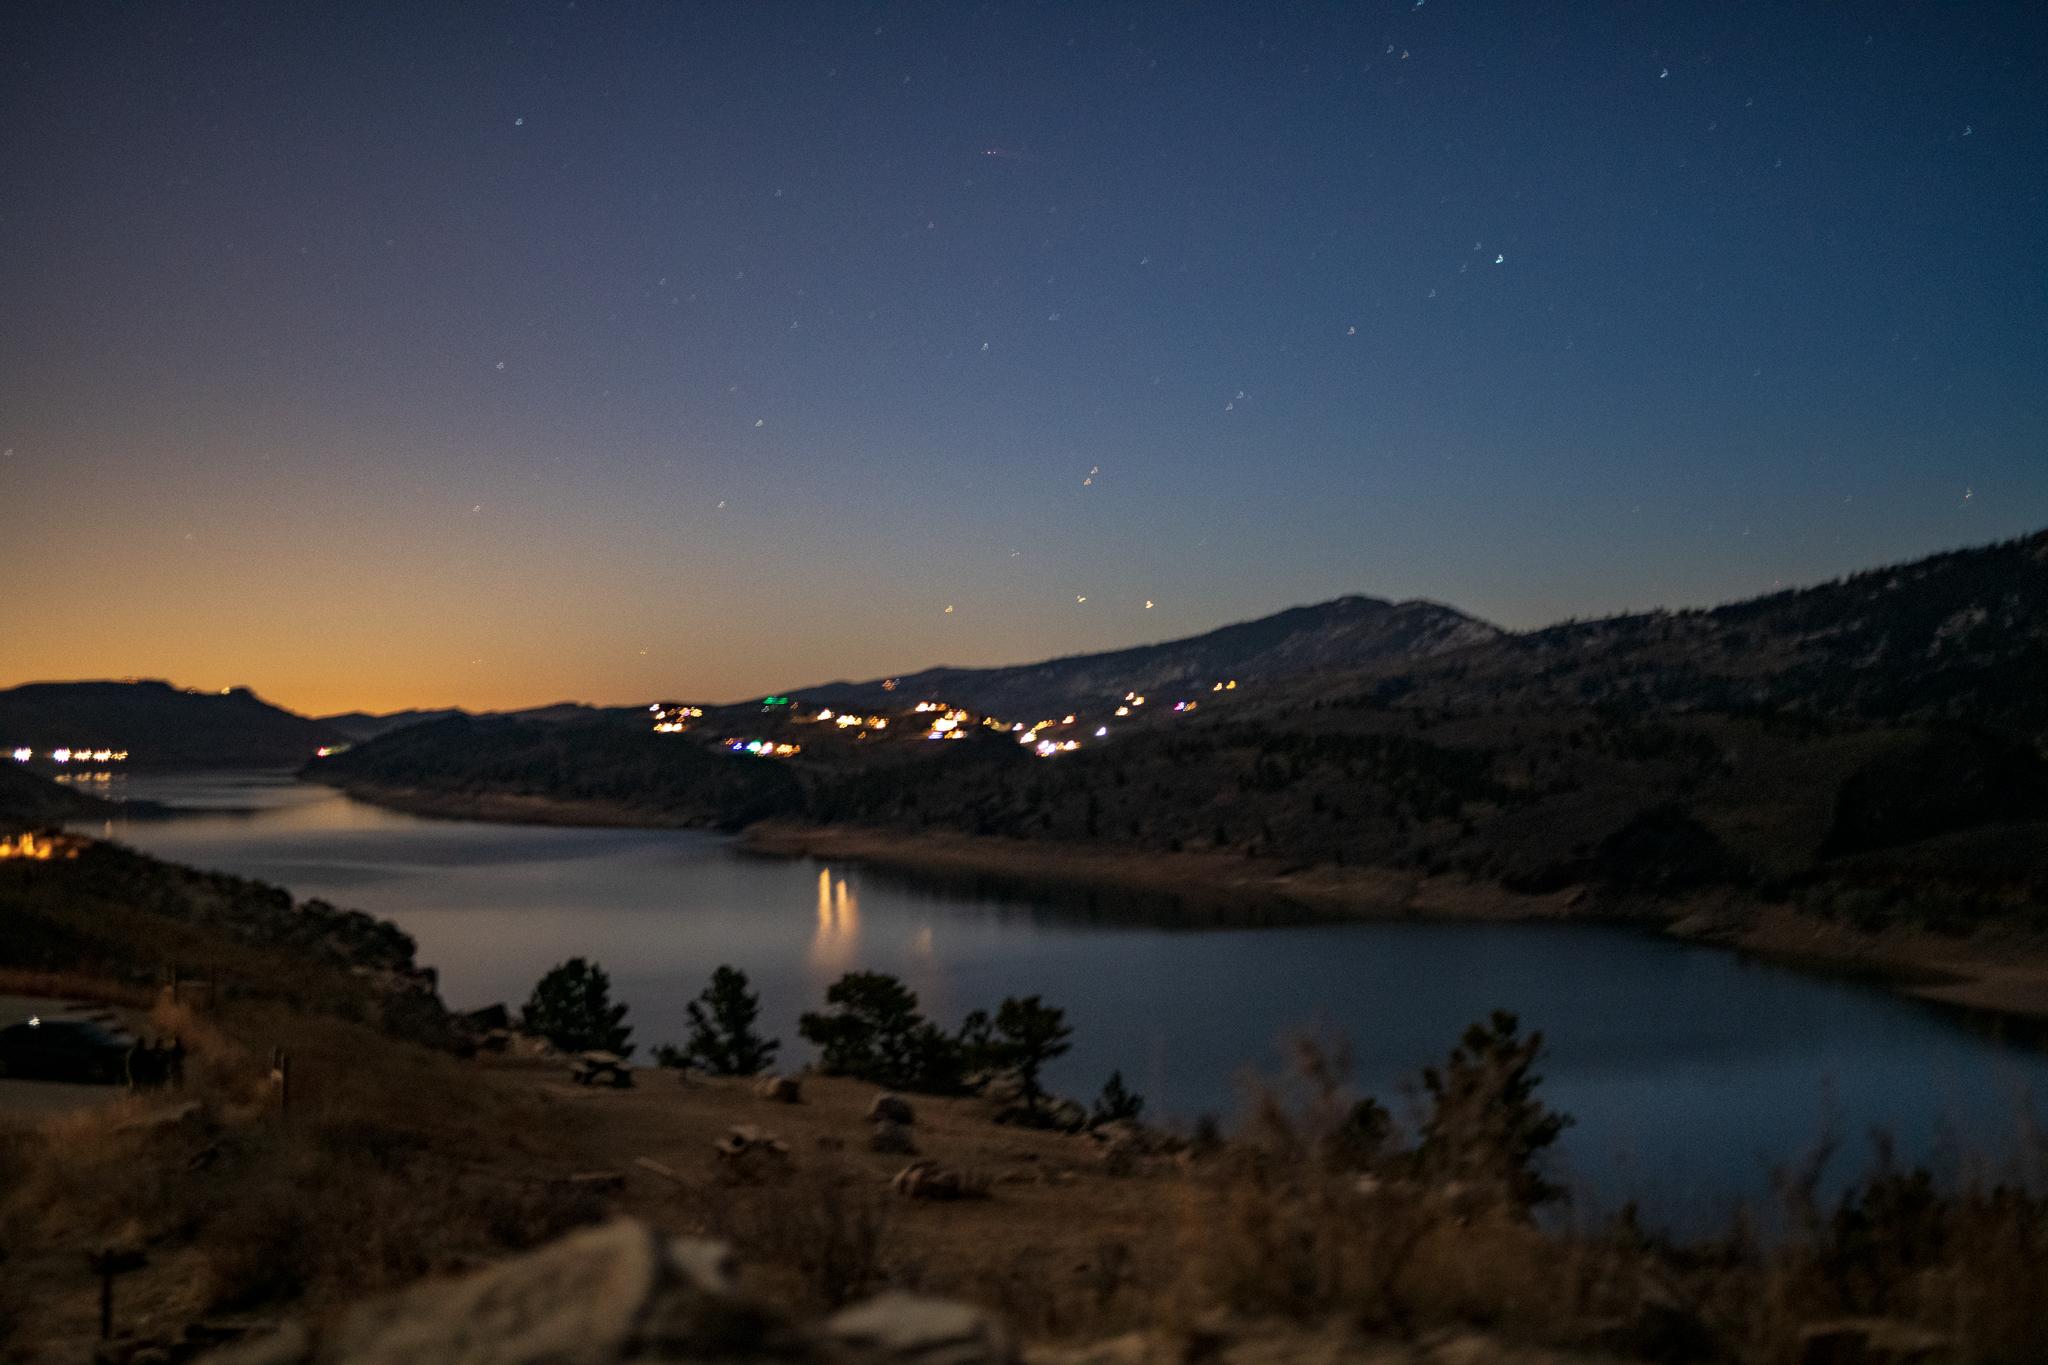 Nighttime -